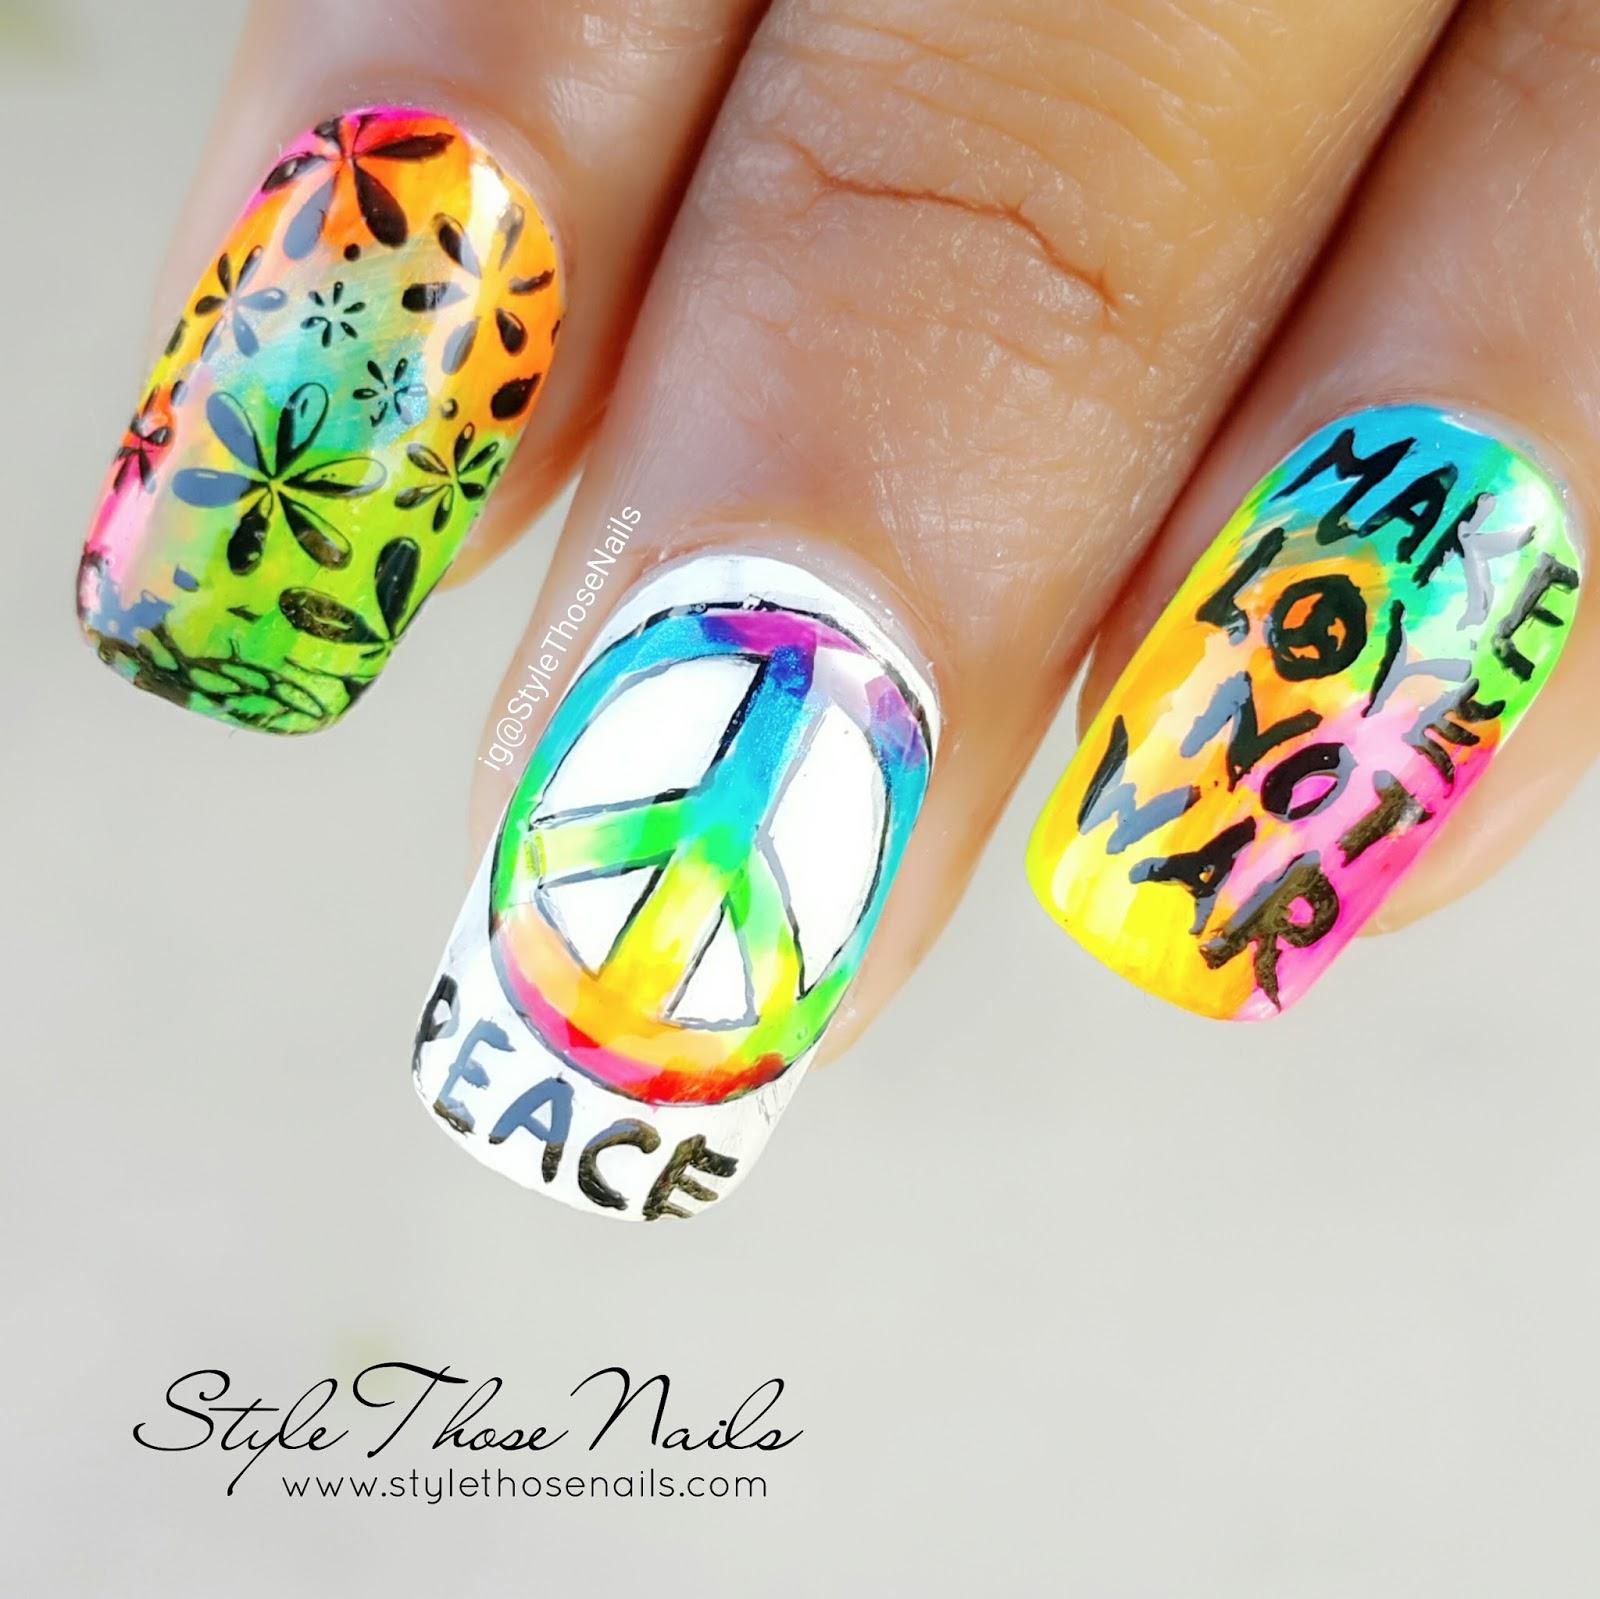 Style Those Nails Hippie Nailart Youtube Collaboration January